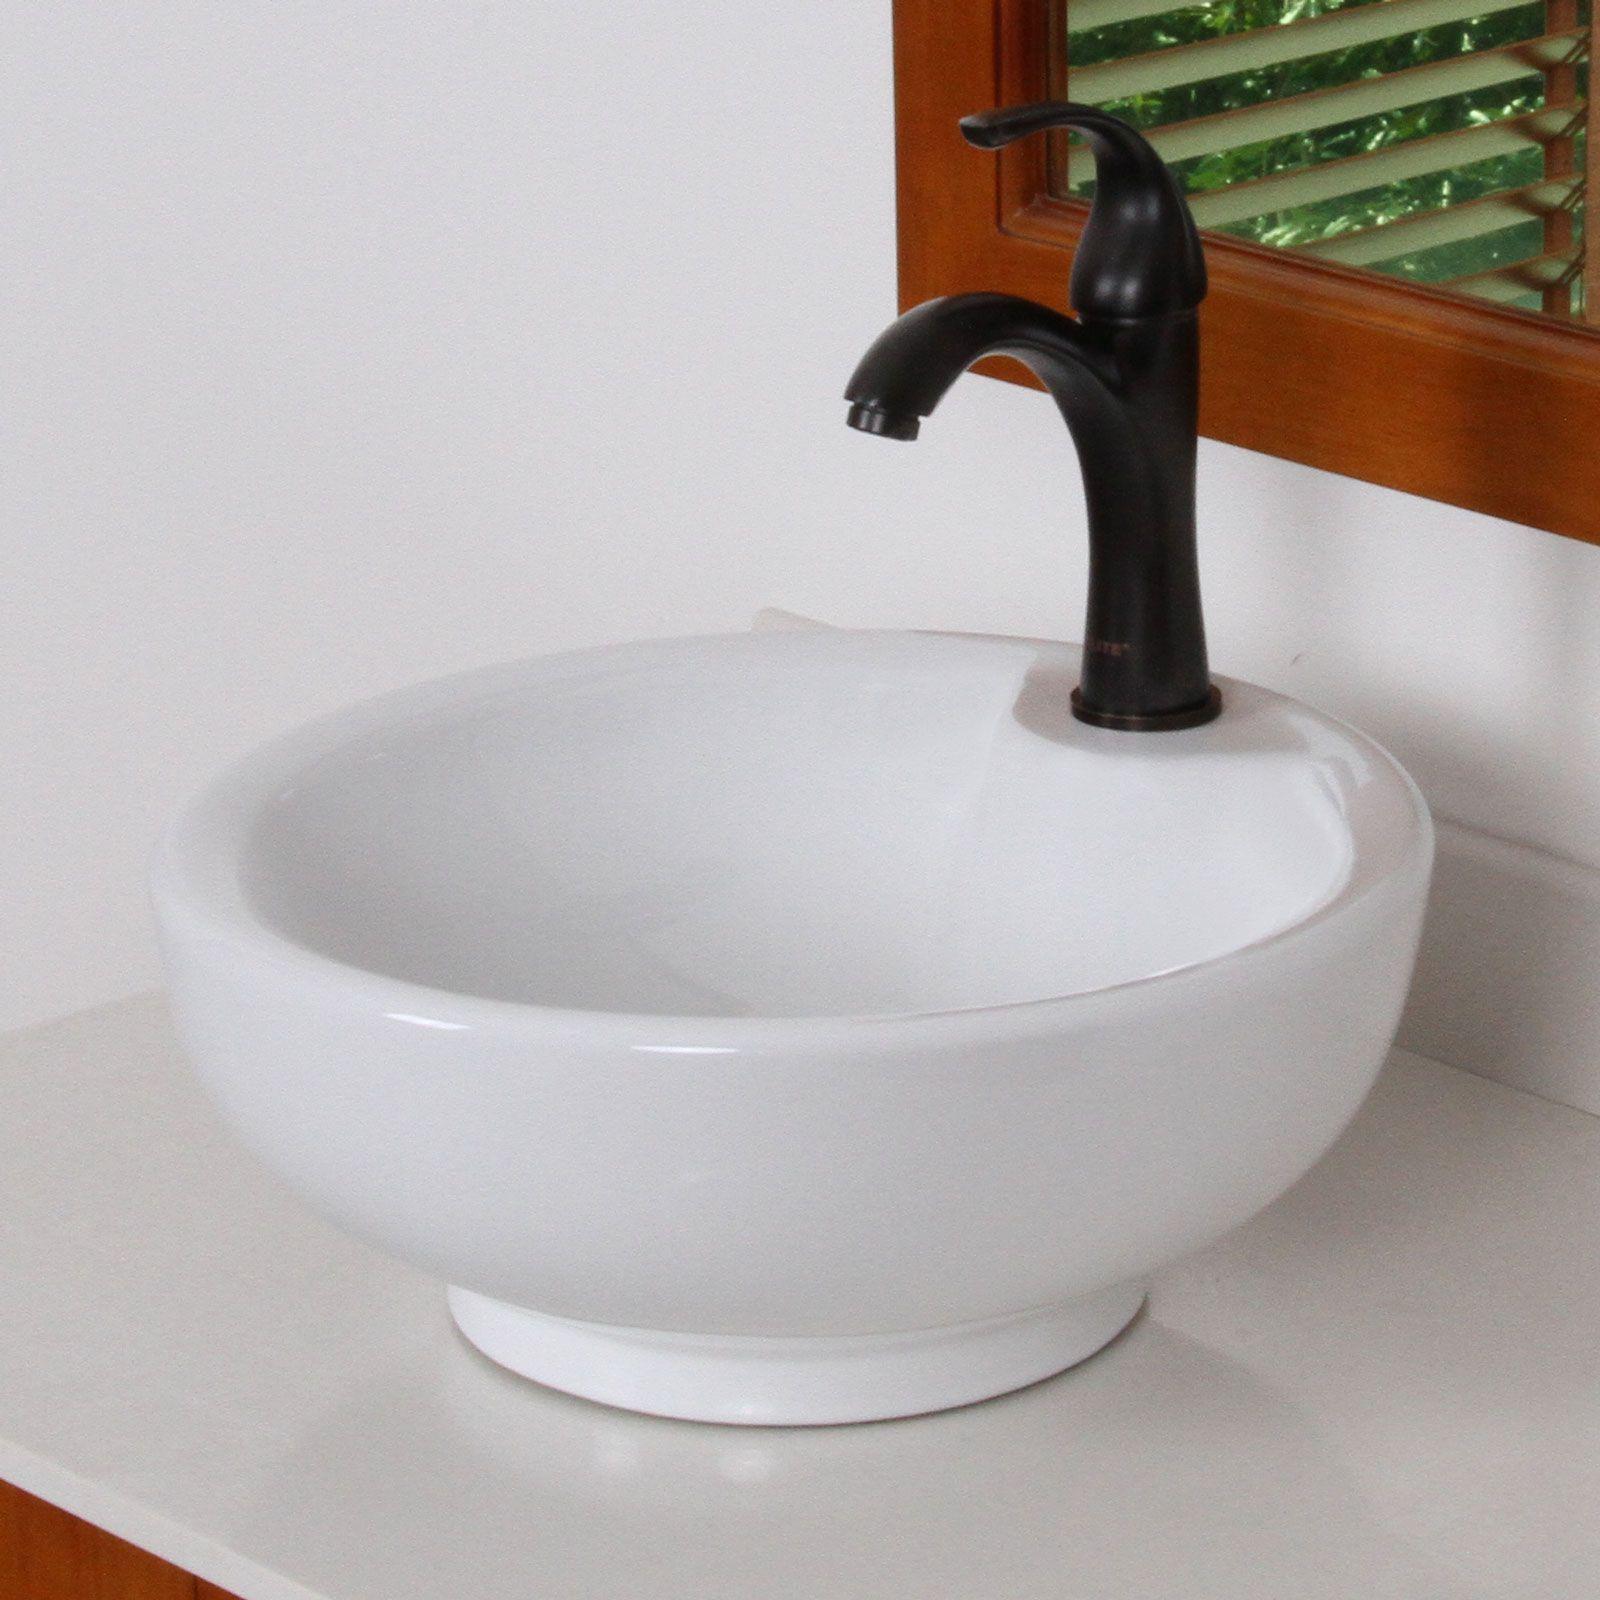 8821orb Elite Oil Rubbed Bronze Single Lever Basin Faucet Bathroom